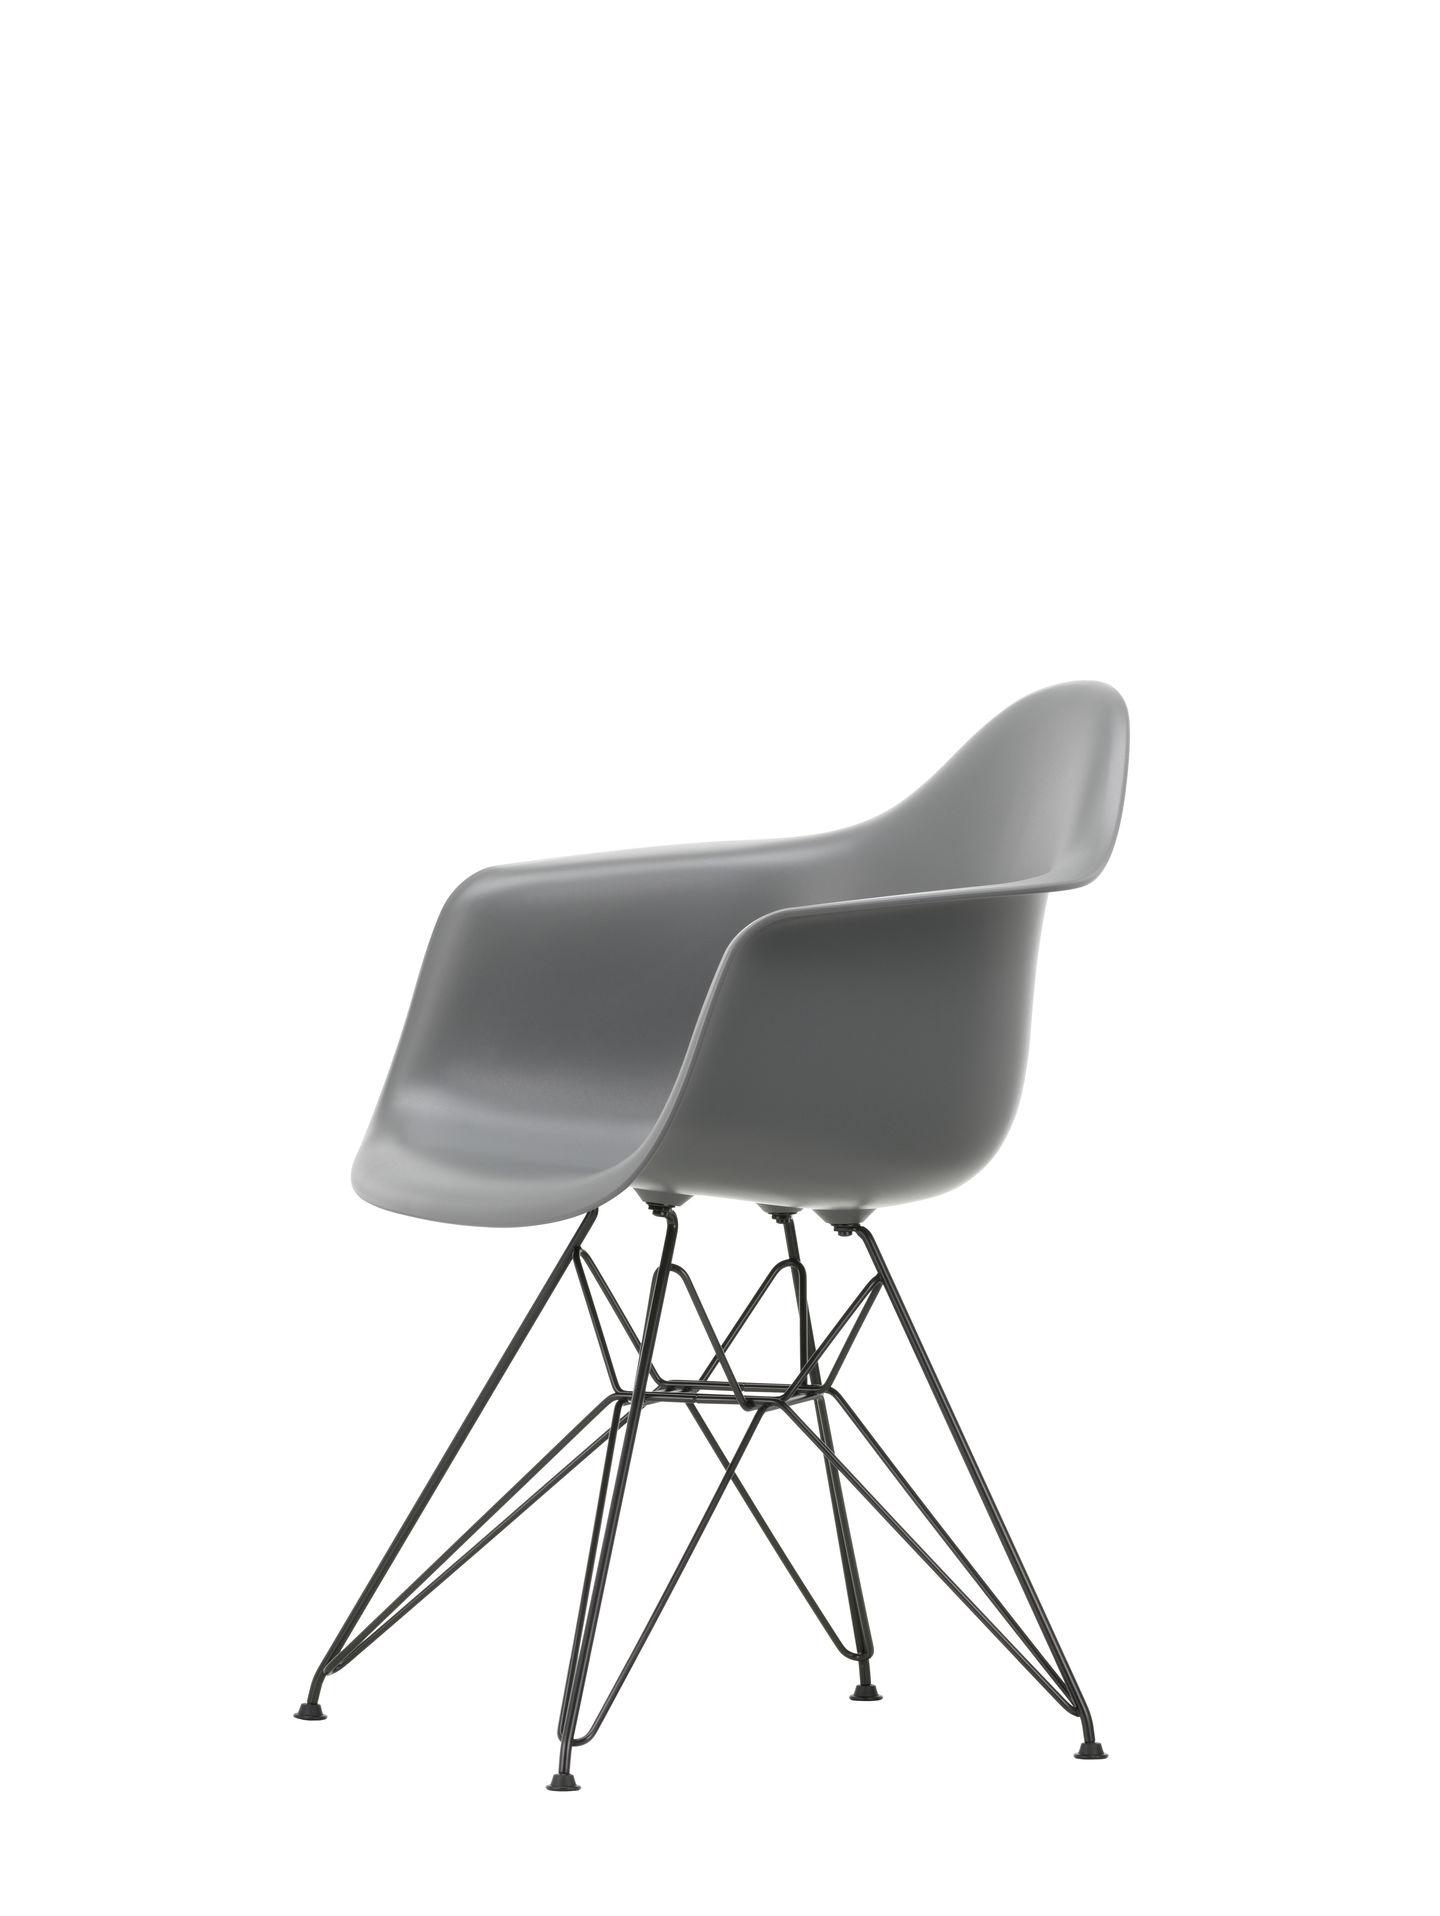 2778827_Eames Plastic Armchair DAR - 56 granite grey - 30 basic dark powder-coated - left_v_fullbleed_1440x.jpg